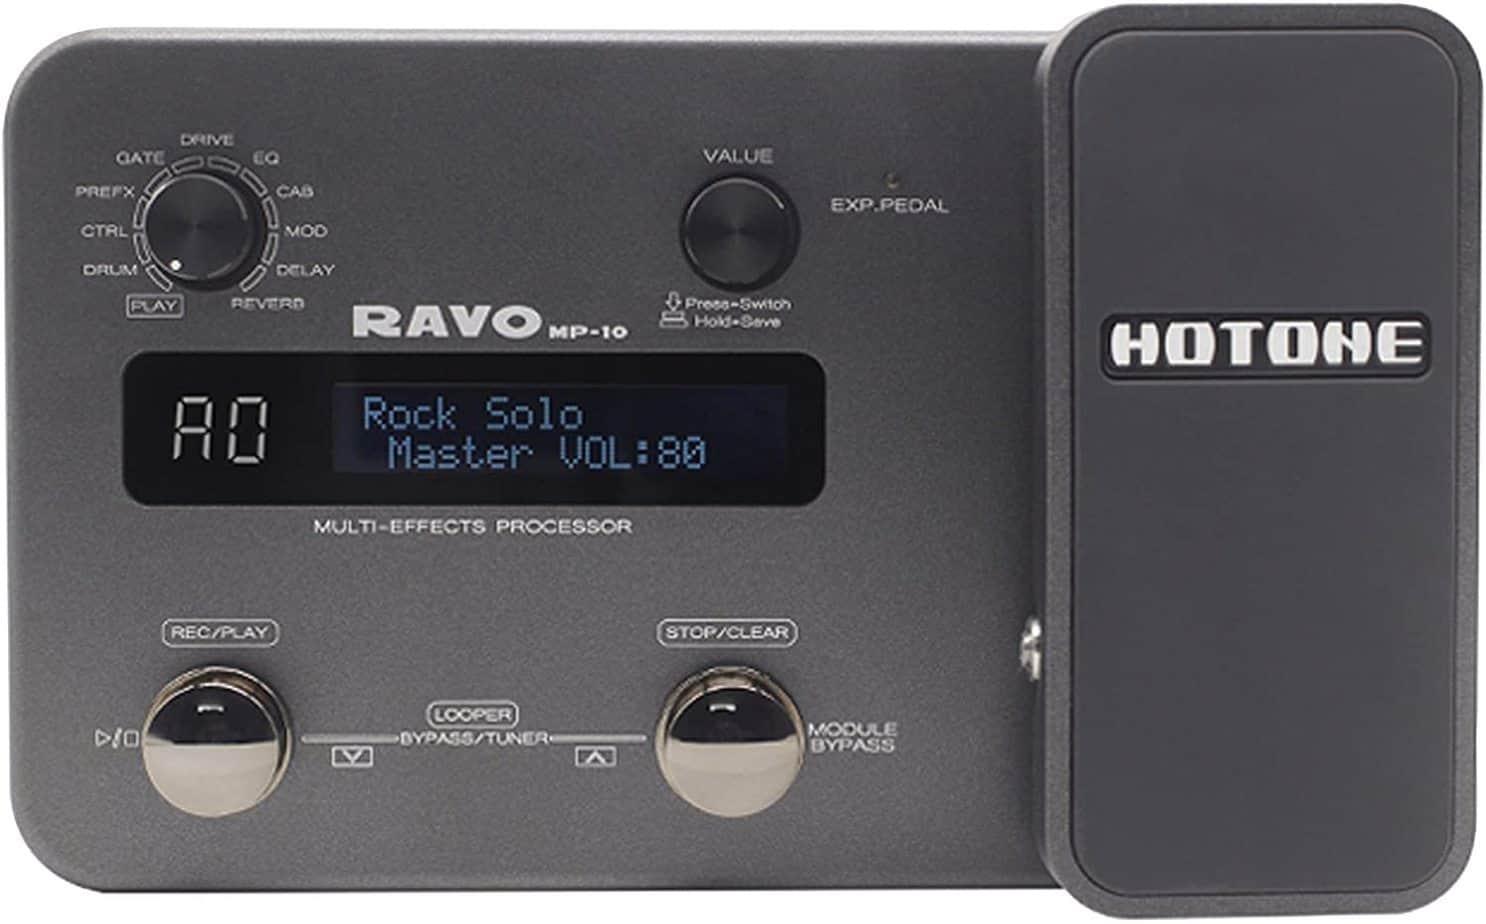 Hotone Ravo MP10 Guitar Multi-Effects | Reverb